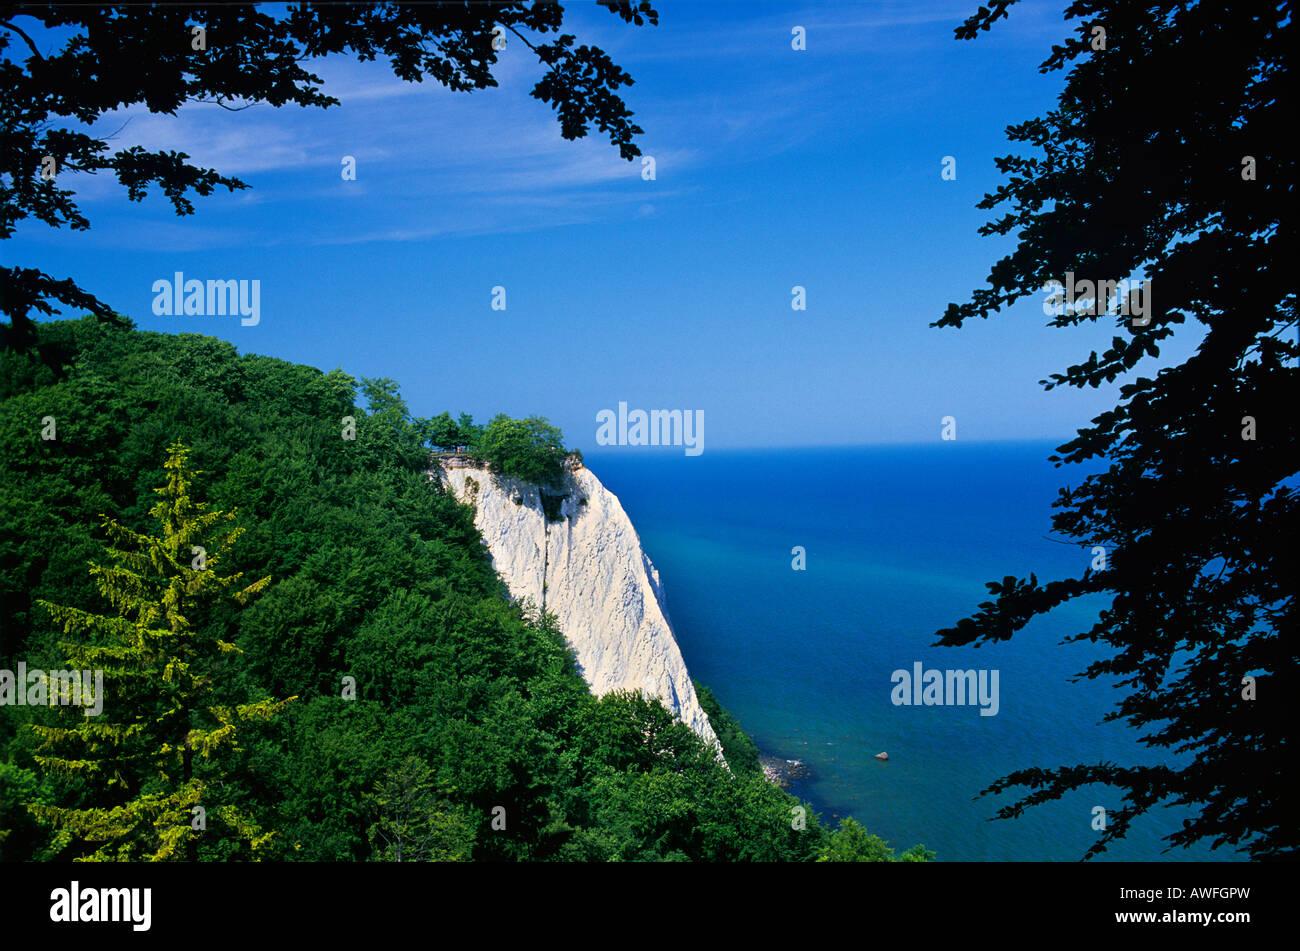 View of the Koenigstuhl rock formation, Jasmund National Park, Ruegen Island, Mecklenburg-Western Pomerania, Germany, - Stock Image